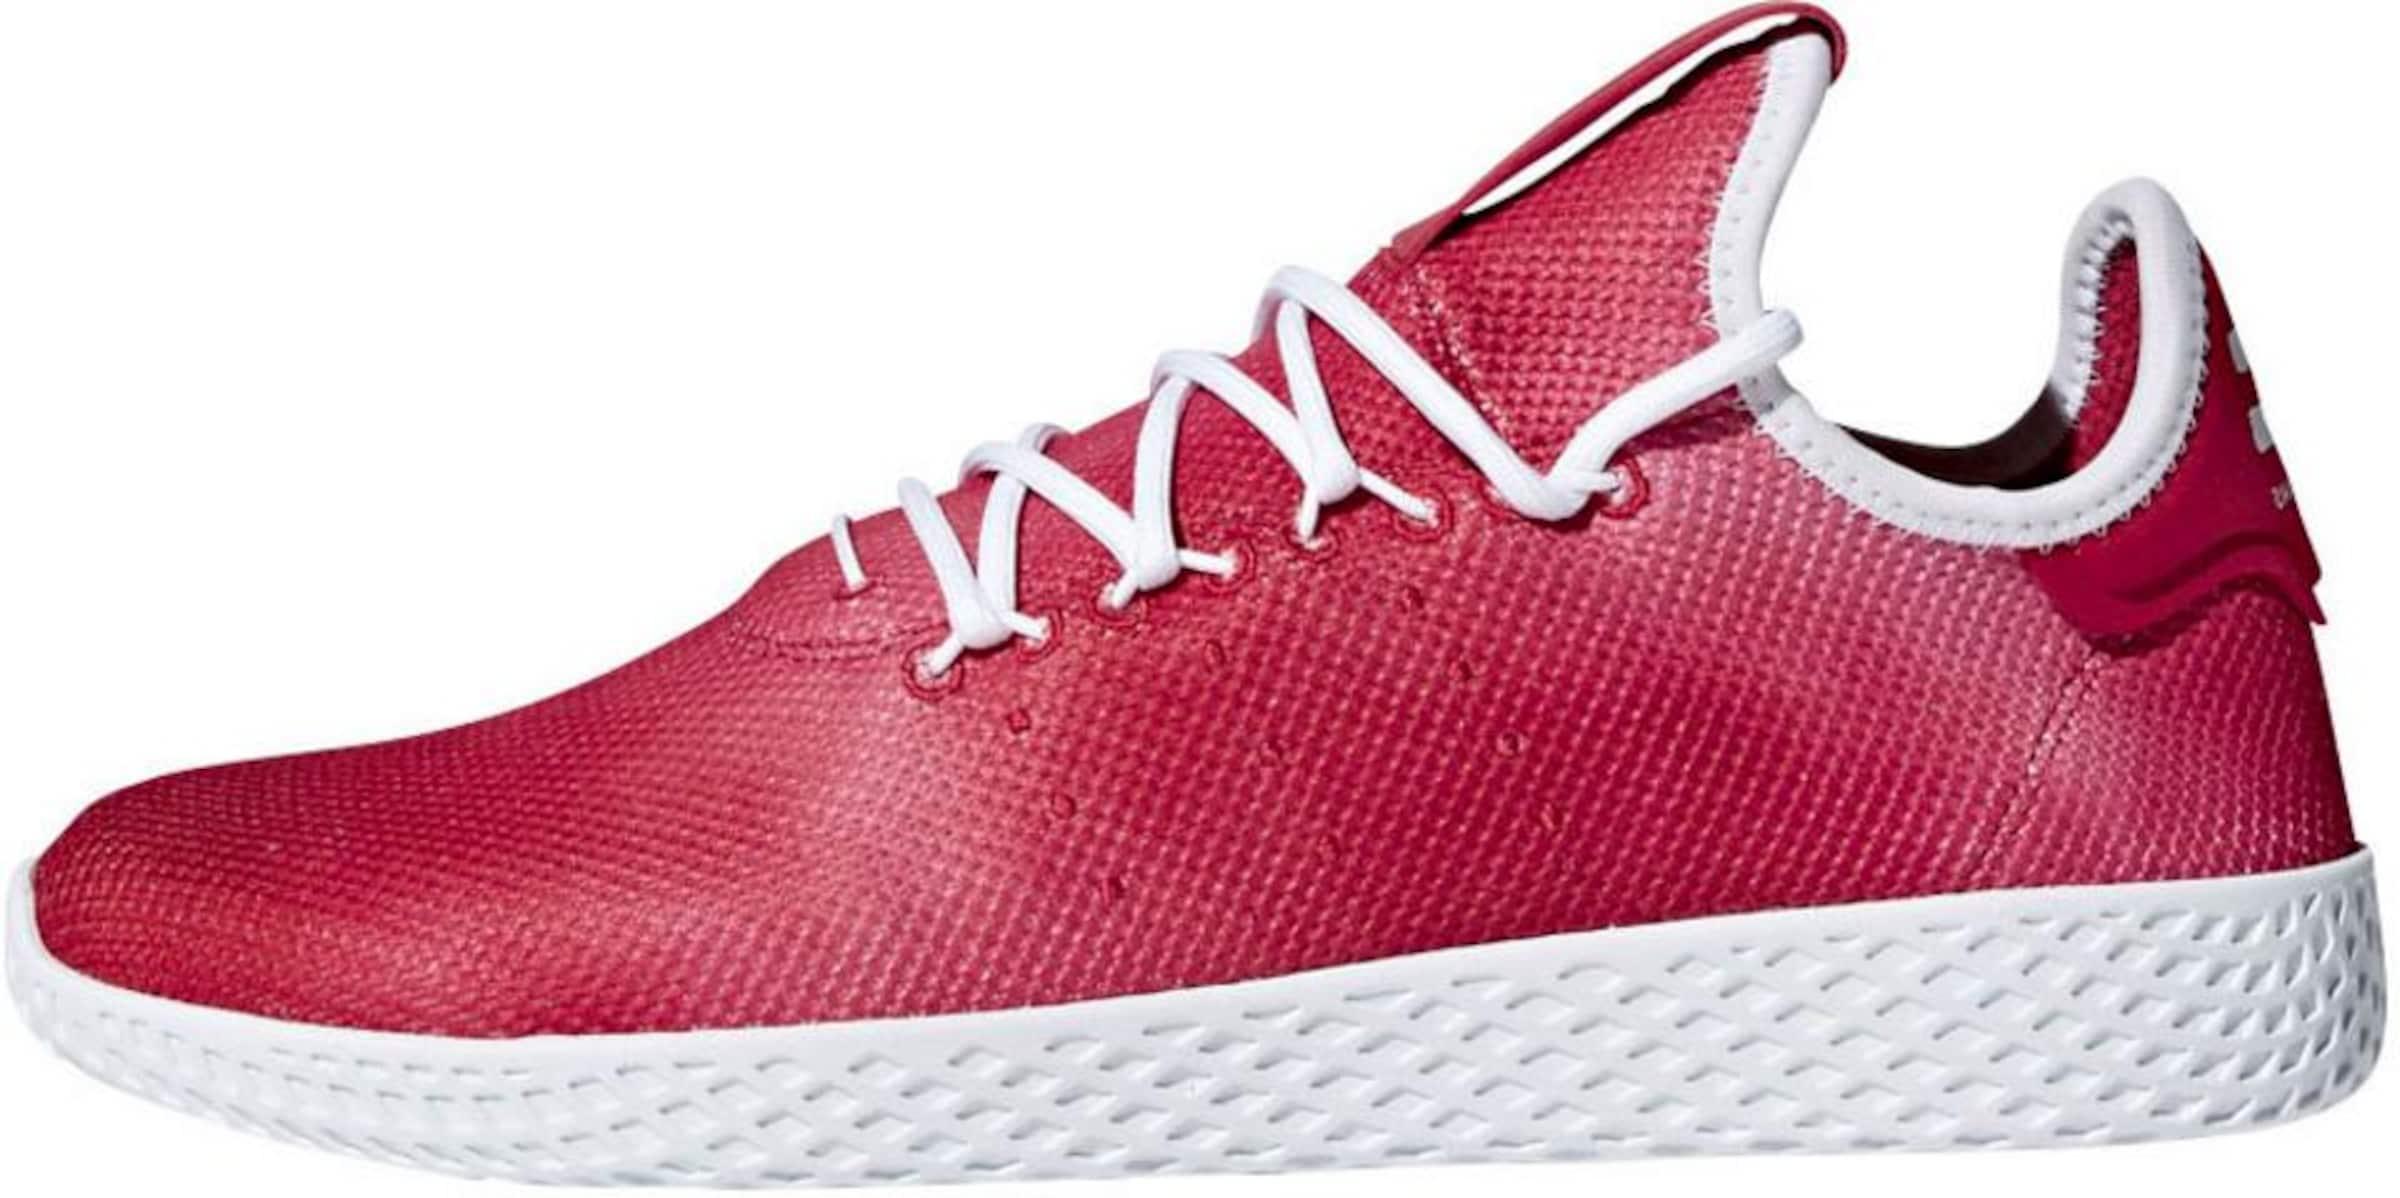 ADIDAS ORIGINALS Sneaker PW HU Holi Tennis